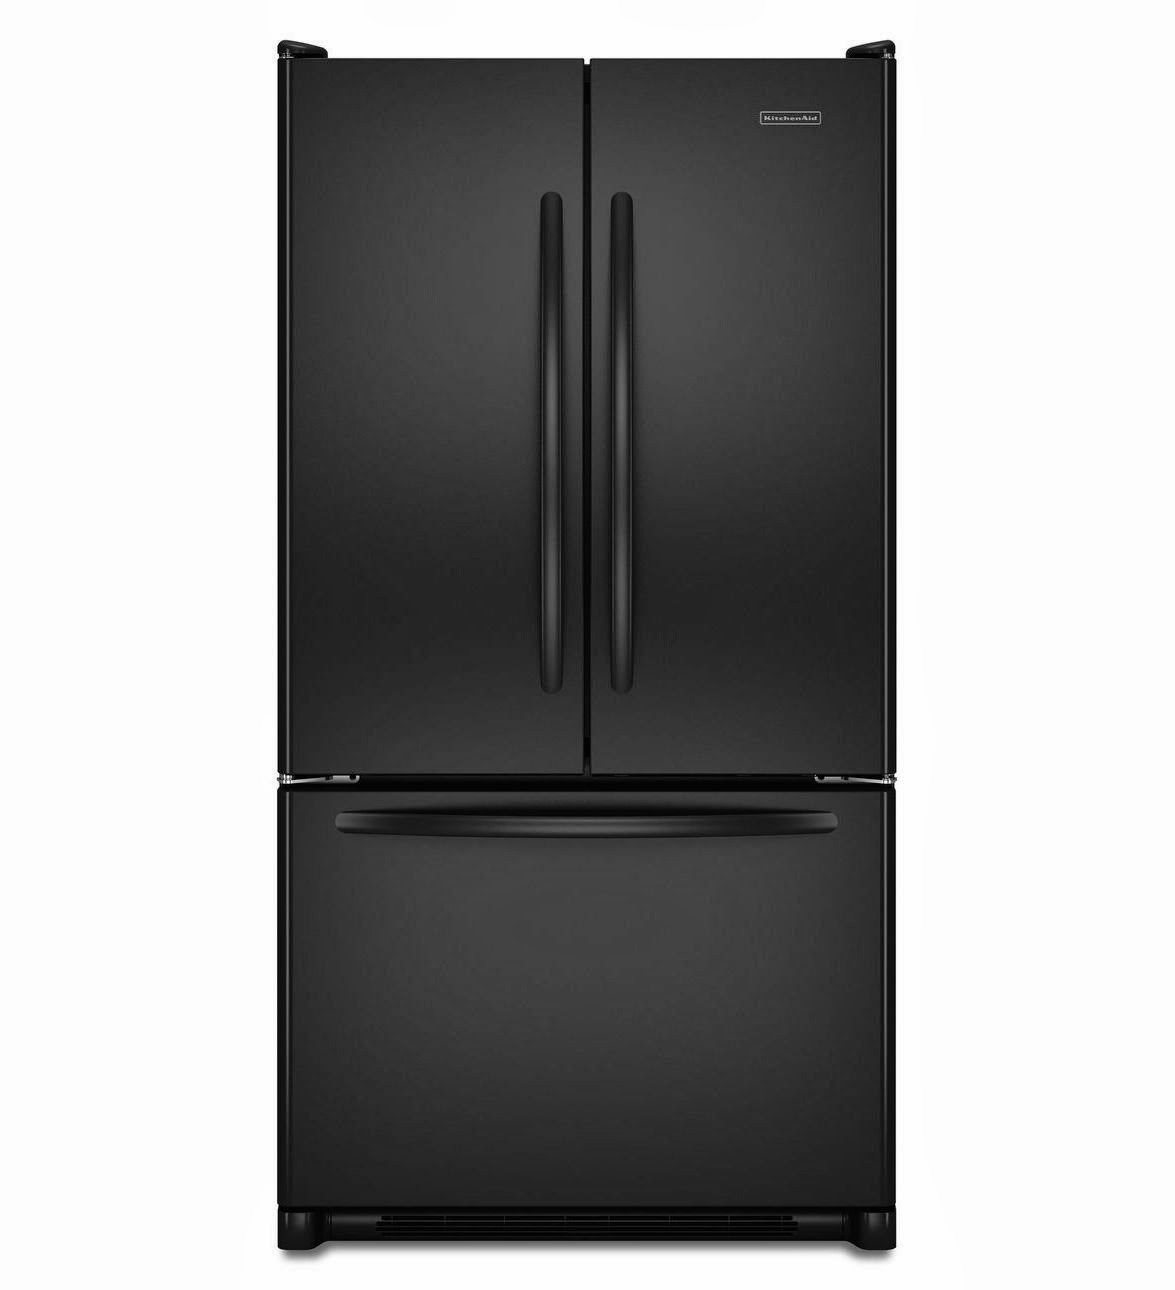 Kitchenaid Black Counter Depth Refrigerator: Counter Depth Refrigerators Reviews: February 2014